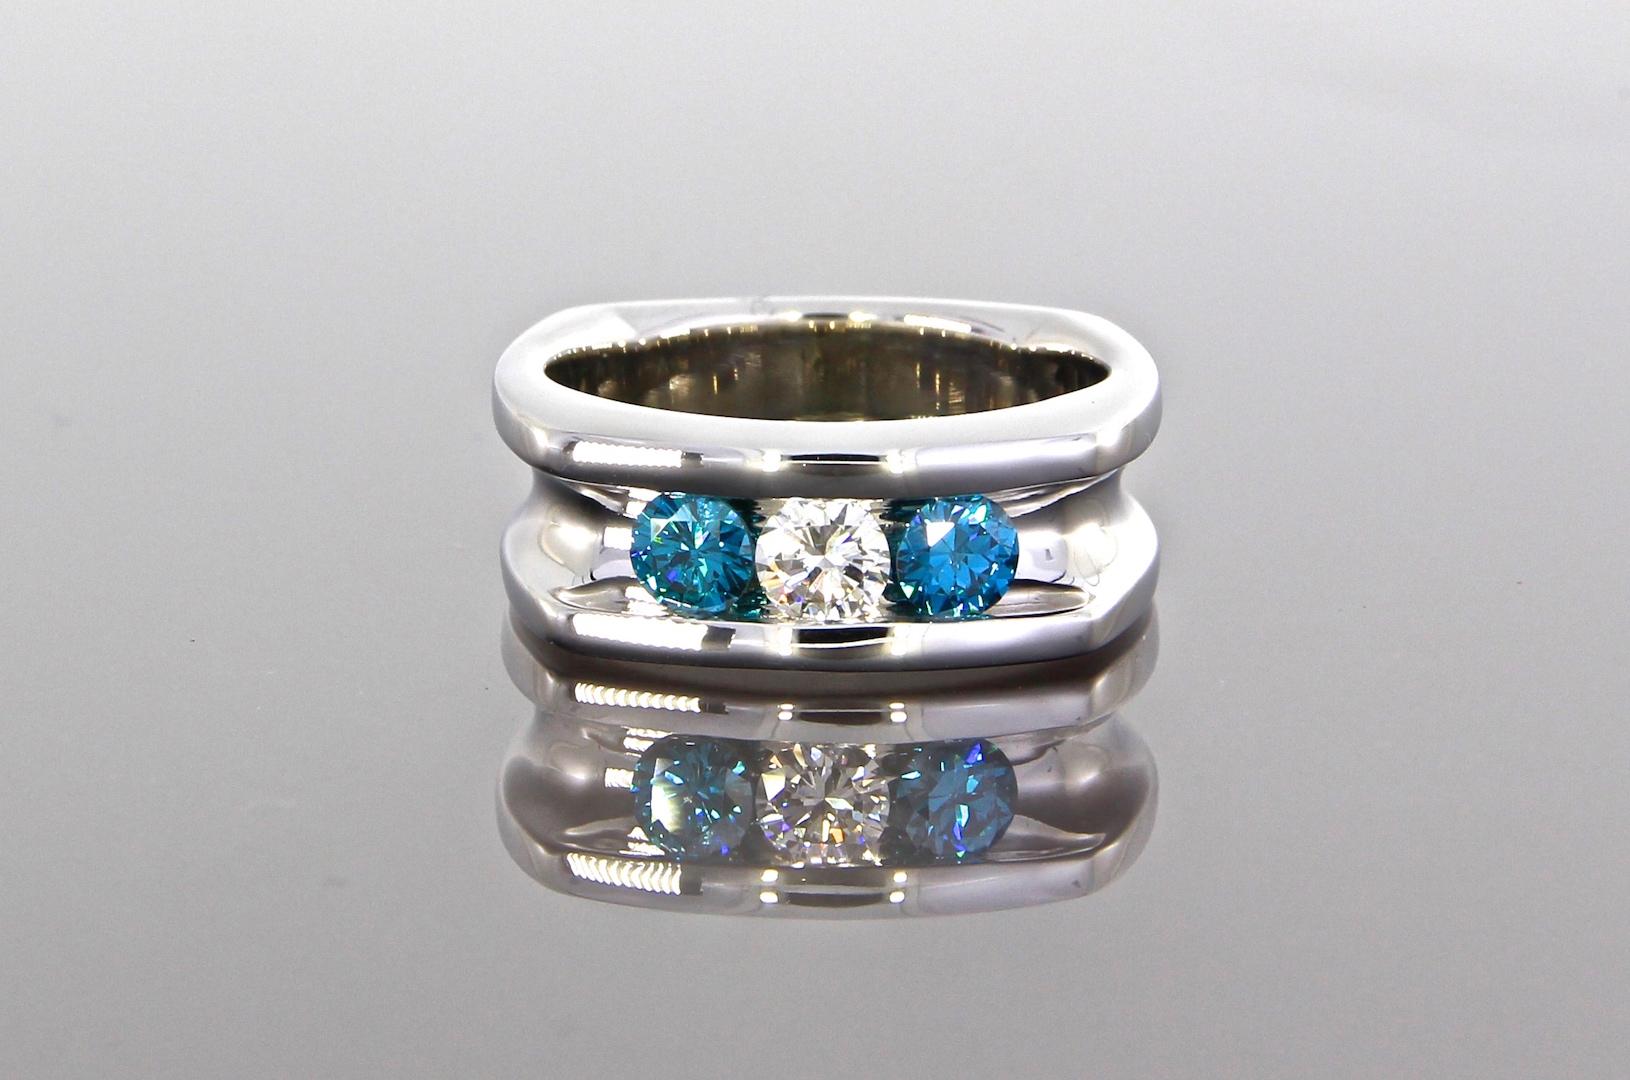 unique-blue-diamond-white-diamond-mens-wedding-band-craft-revival-jewelry-store-grand-rapids